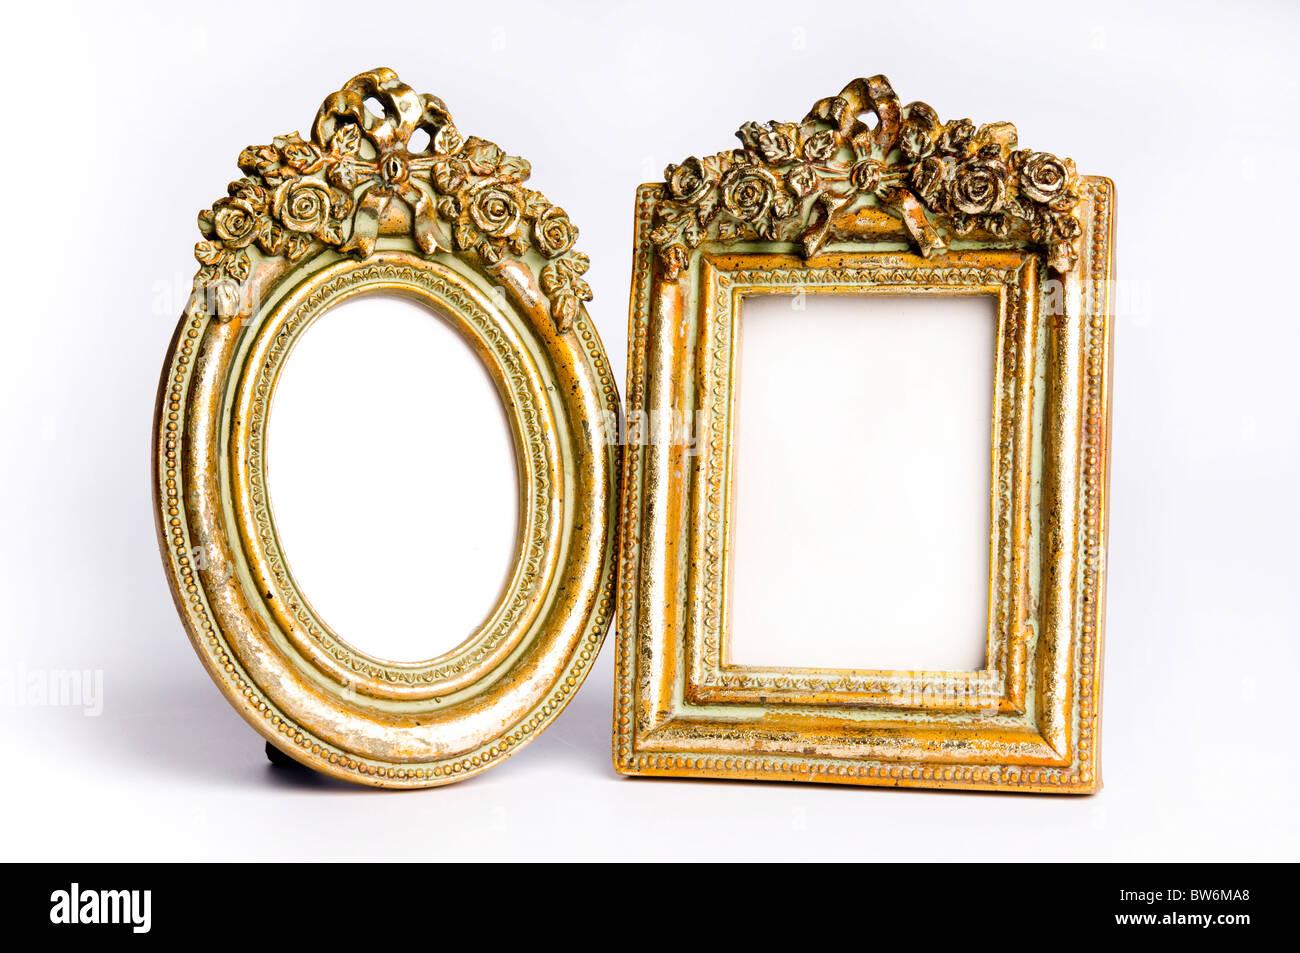 Vintage Bilderrahmen dekoriert Stockfoto, Bild: 32724448 - Alamy